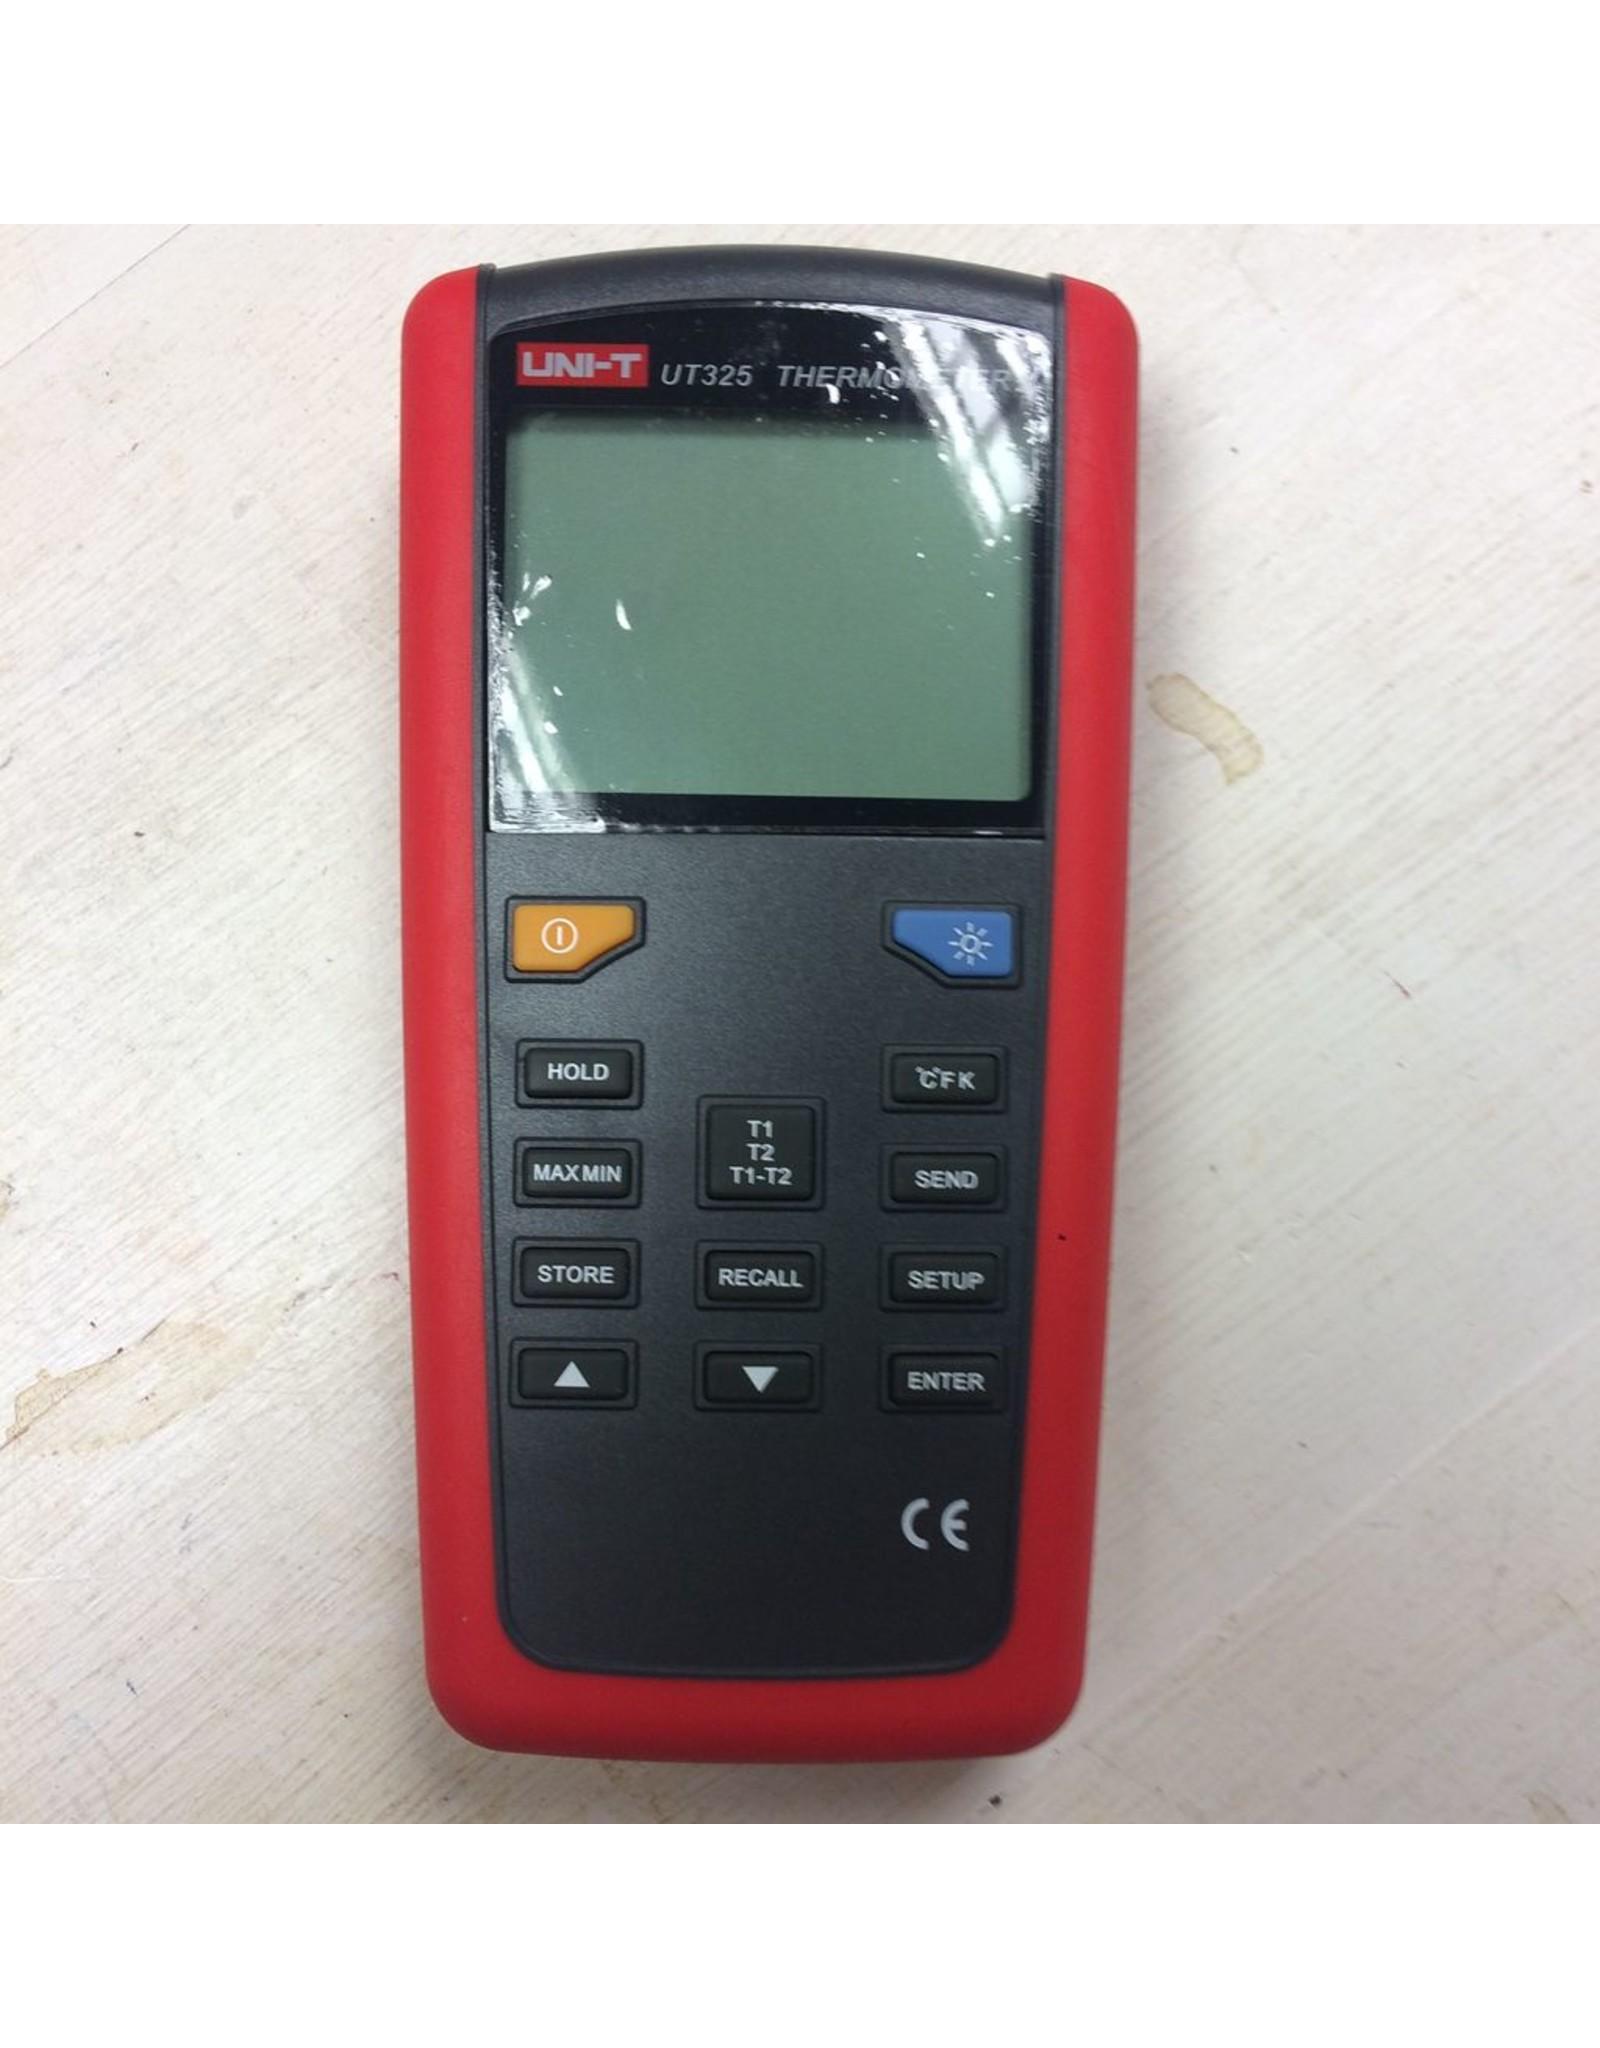 UT325 Digital Pyrometer/Thermometer